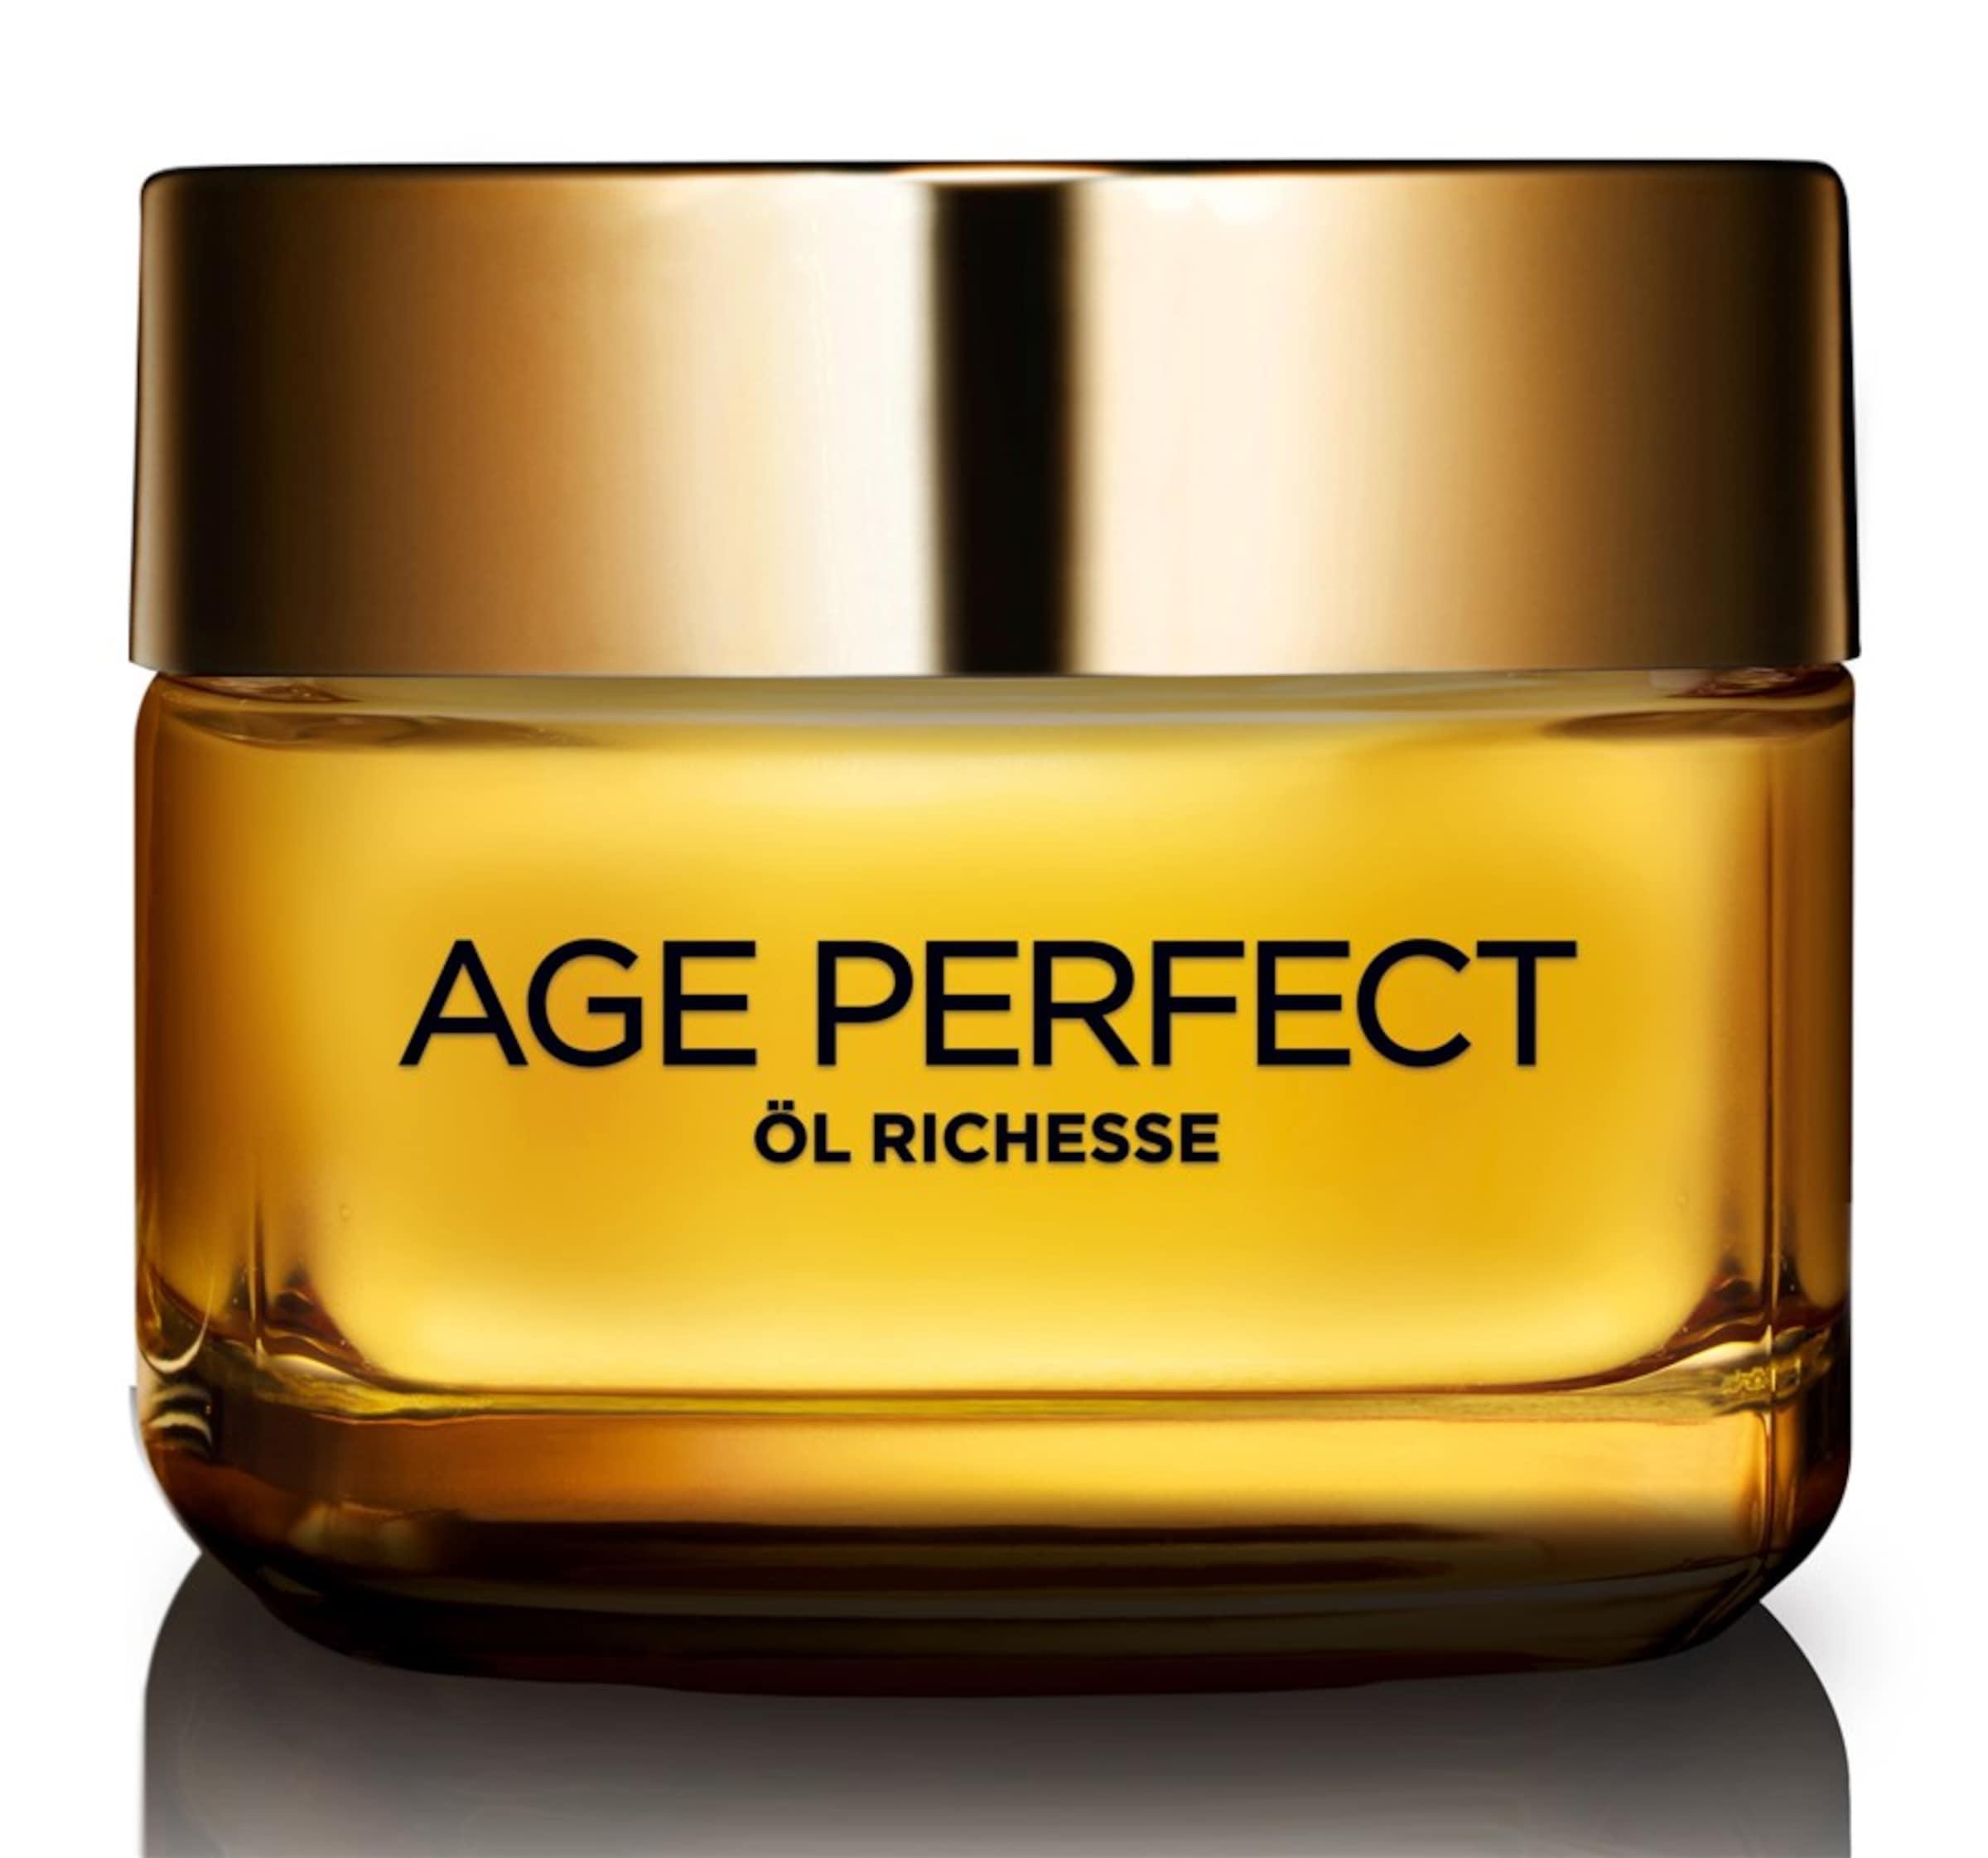 In Gold 'öl creme Richesse'Pflegende Öl L'oréal Paris 3AqS5jc4RL